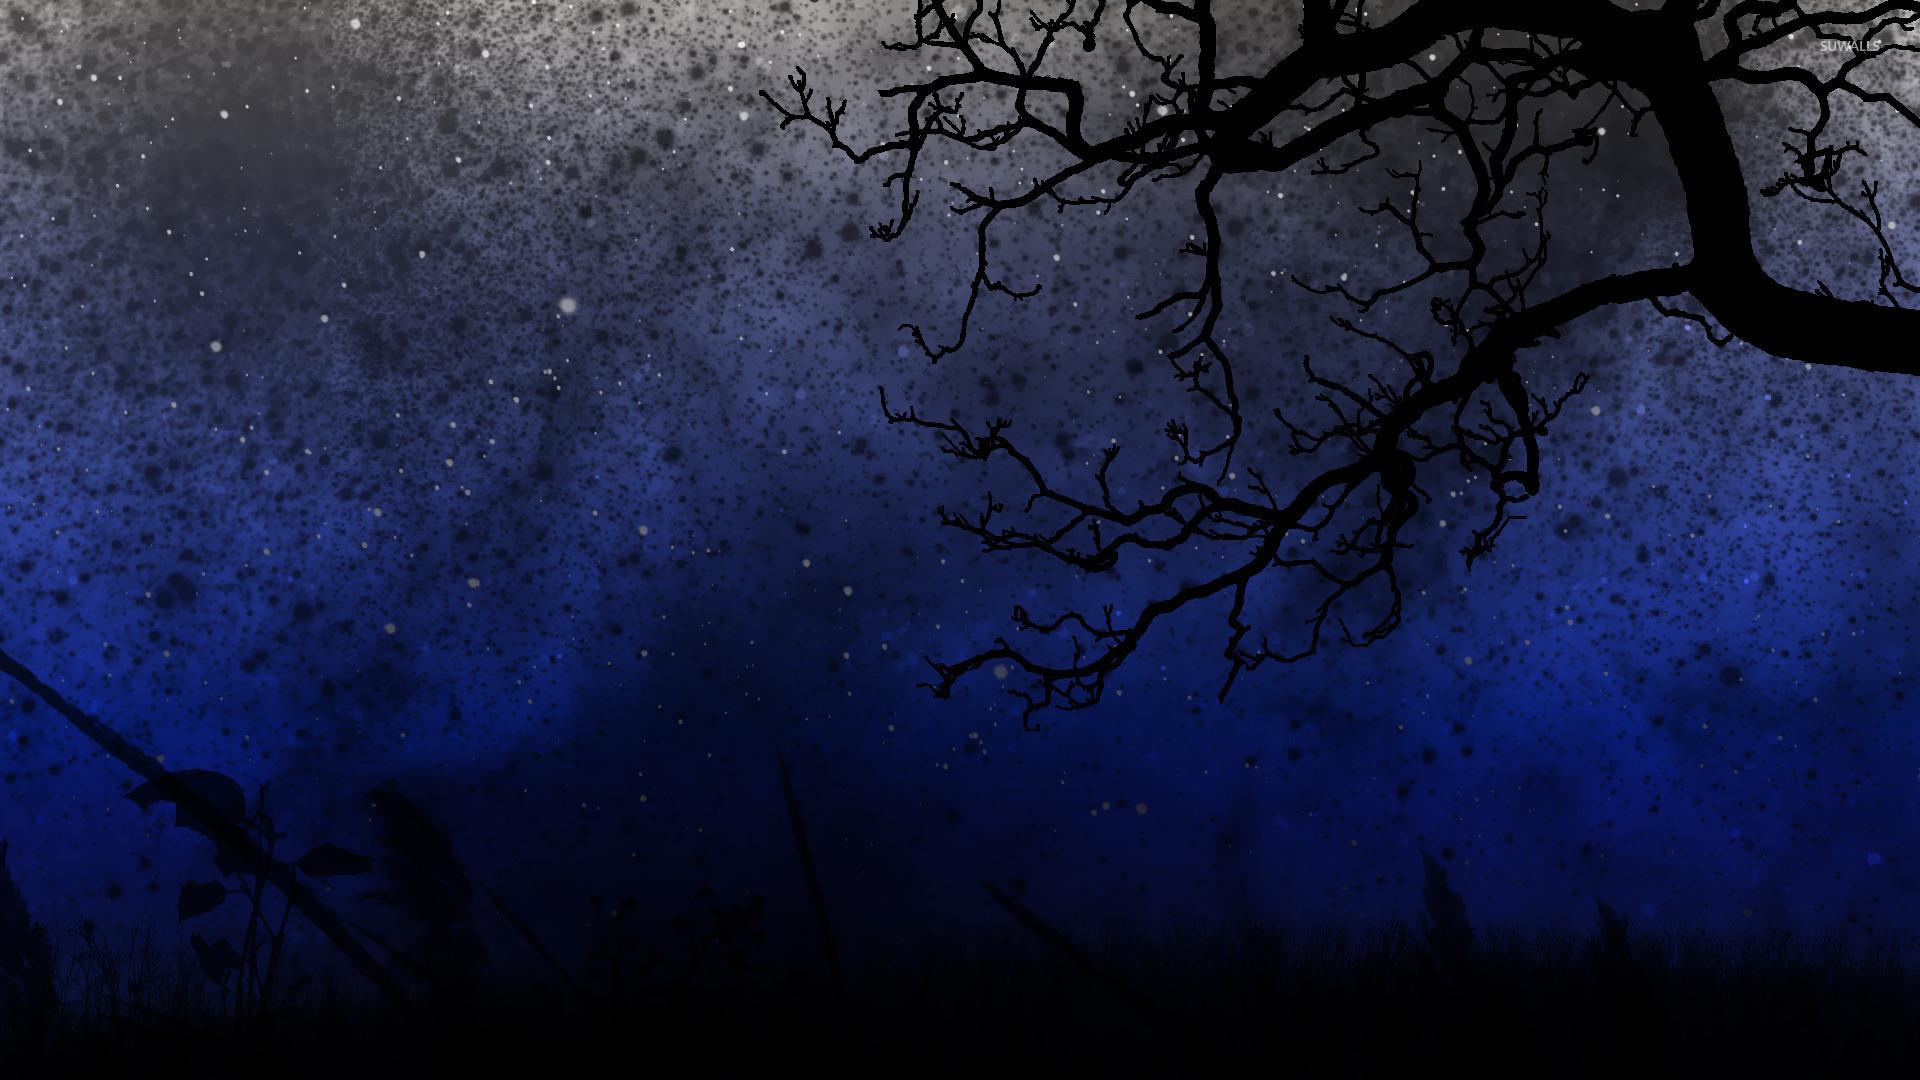 Starry night sky wallpaper   Digital Art wallpapers   15836 1680x1050